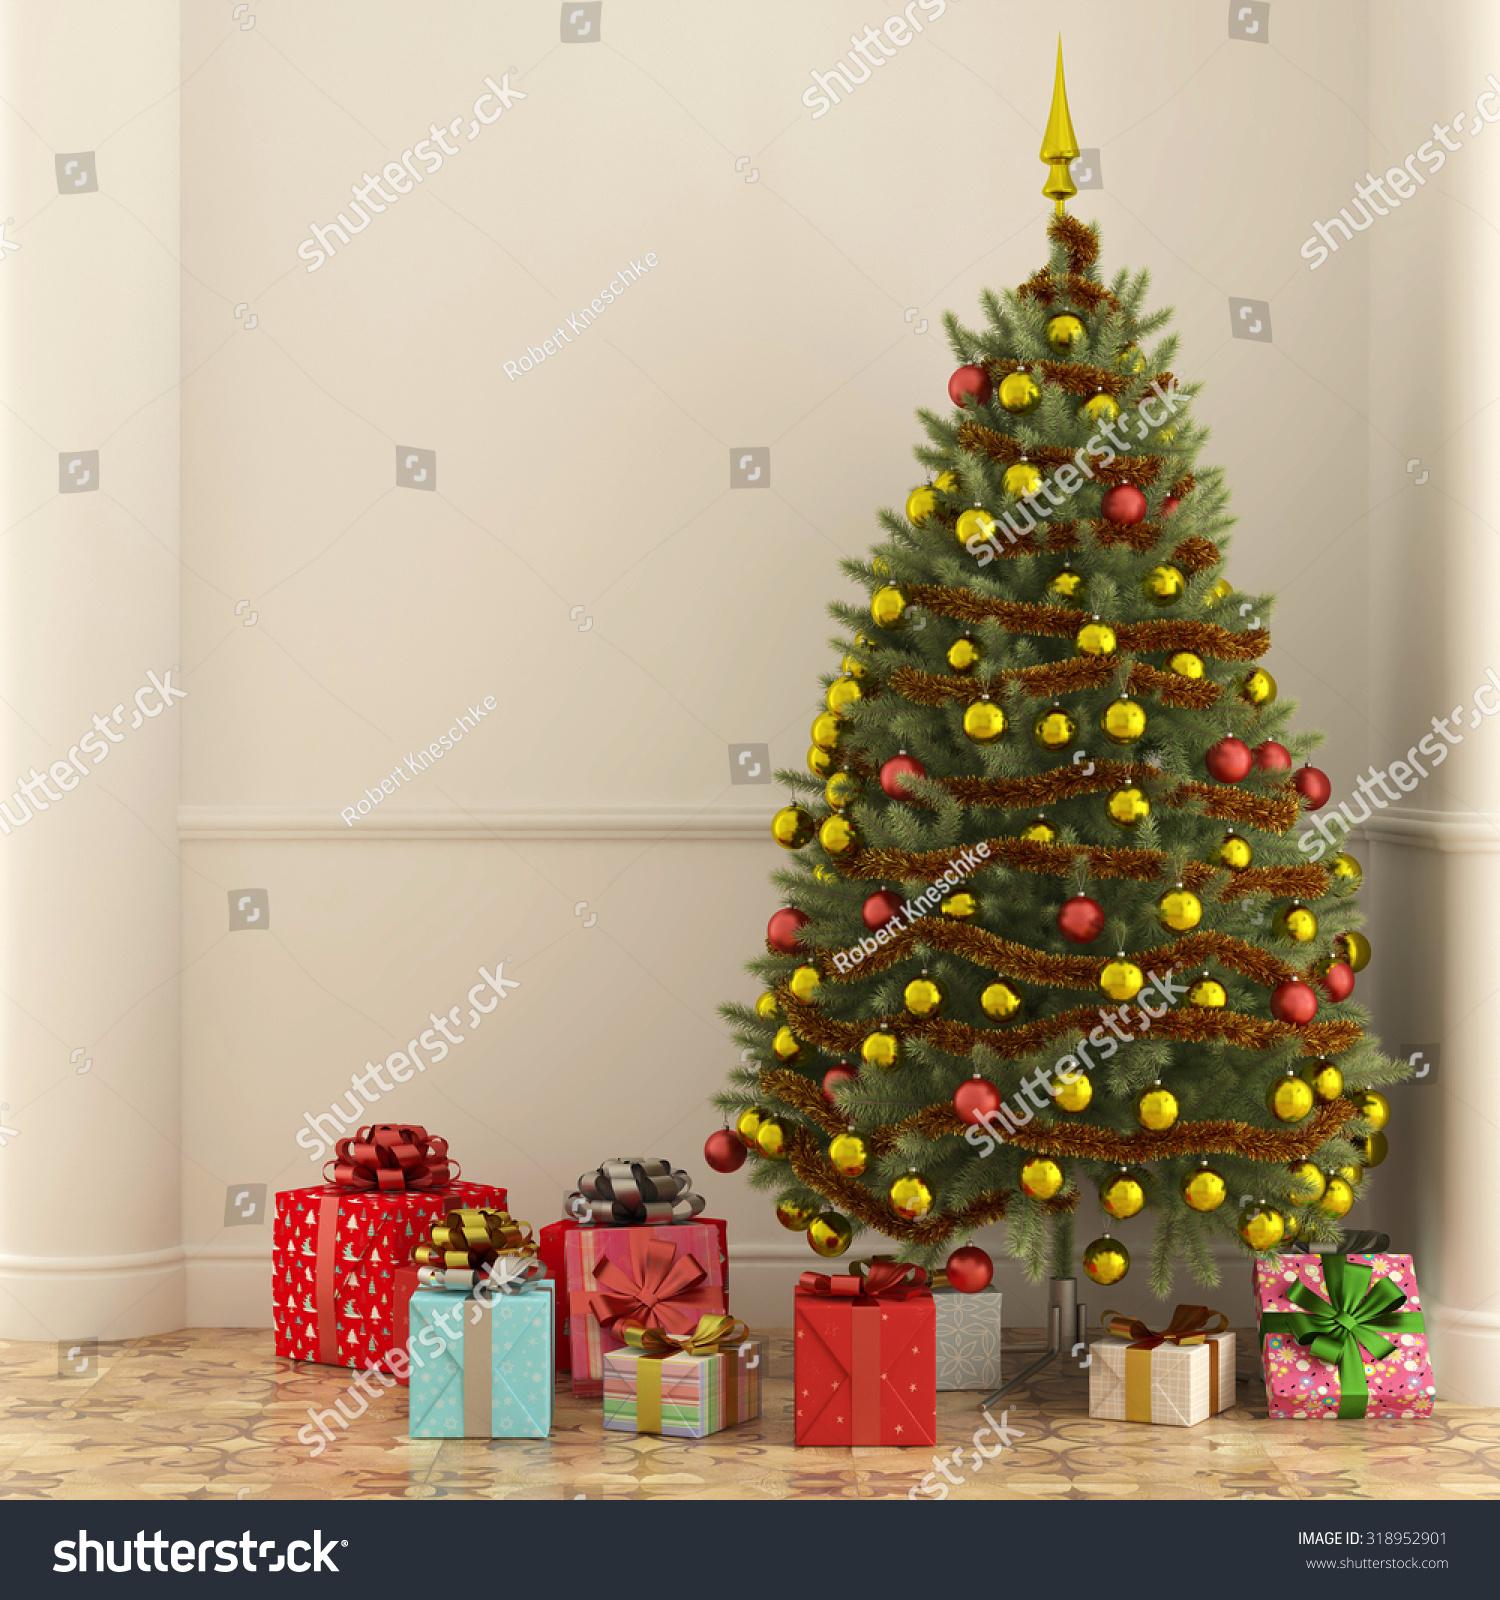 Many Gifts Under Christmas Tree Christmas Stock Illustration ...